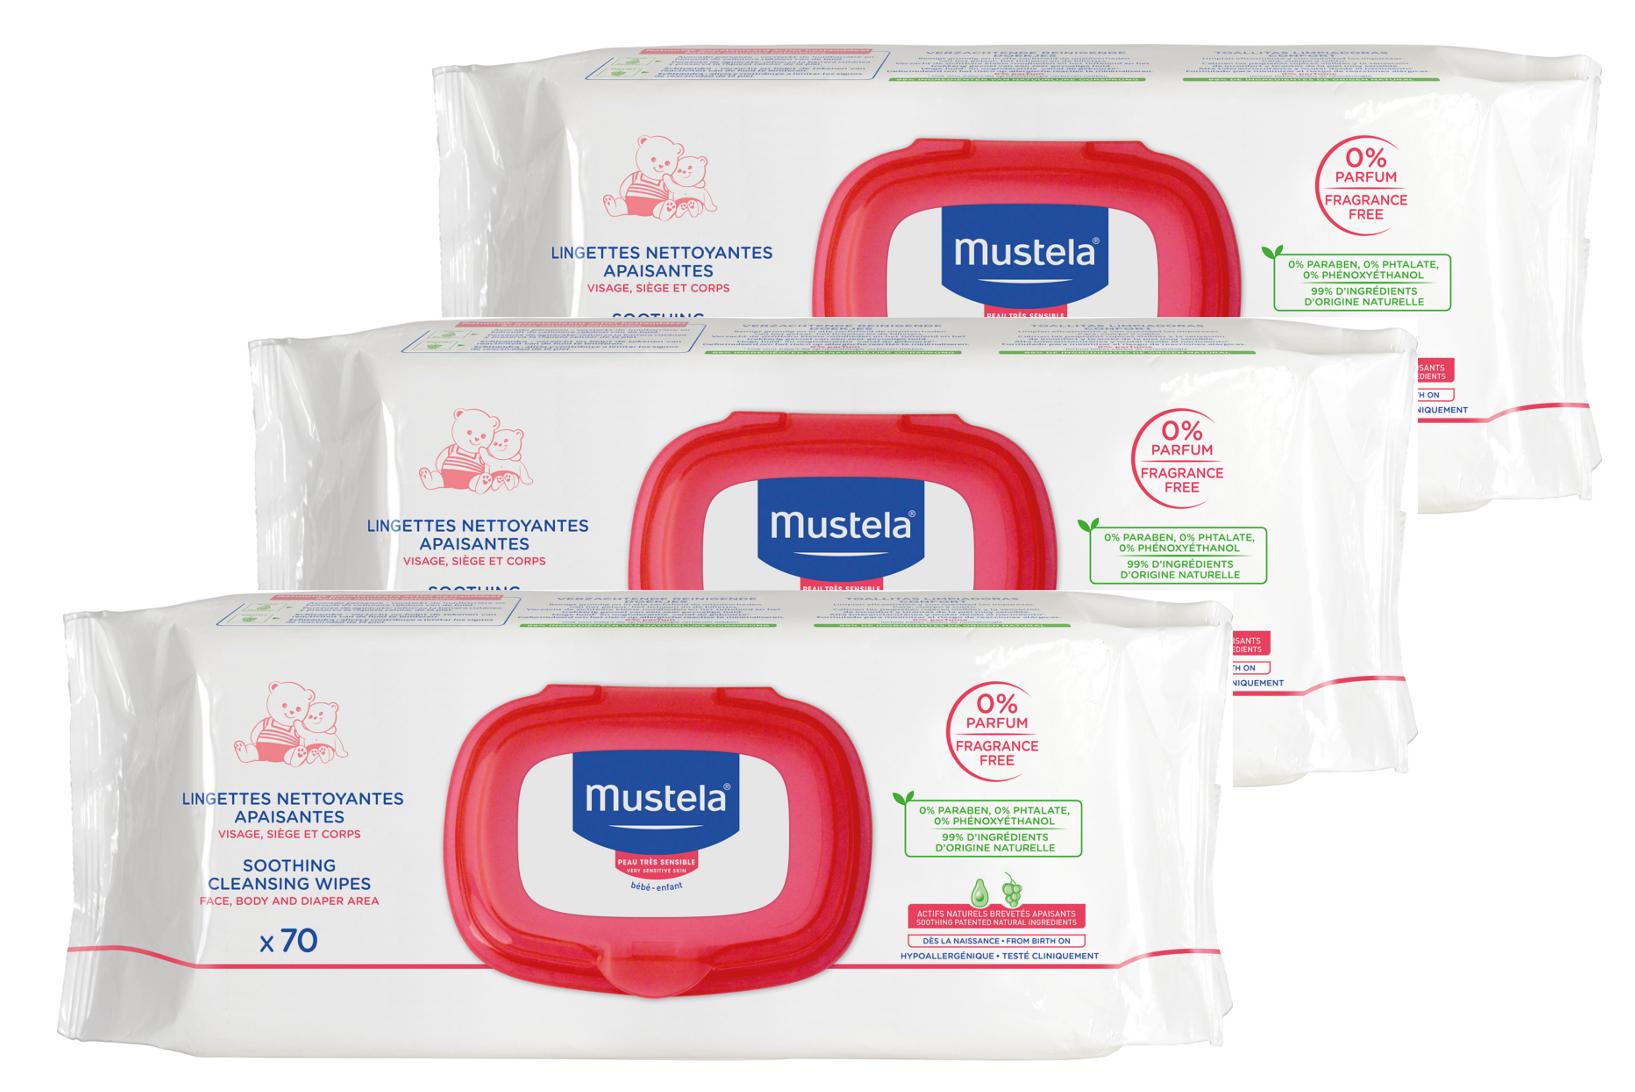 Mustela - Toalhetes de Limpeza Sem Perfume 3x70 unidades